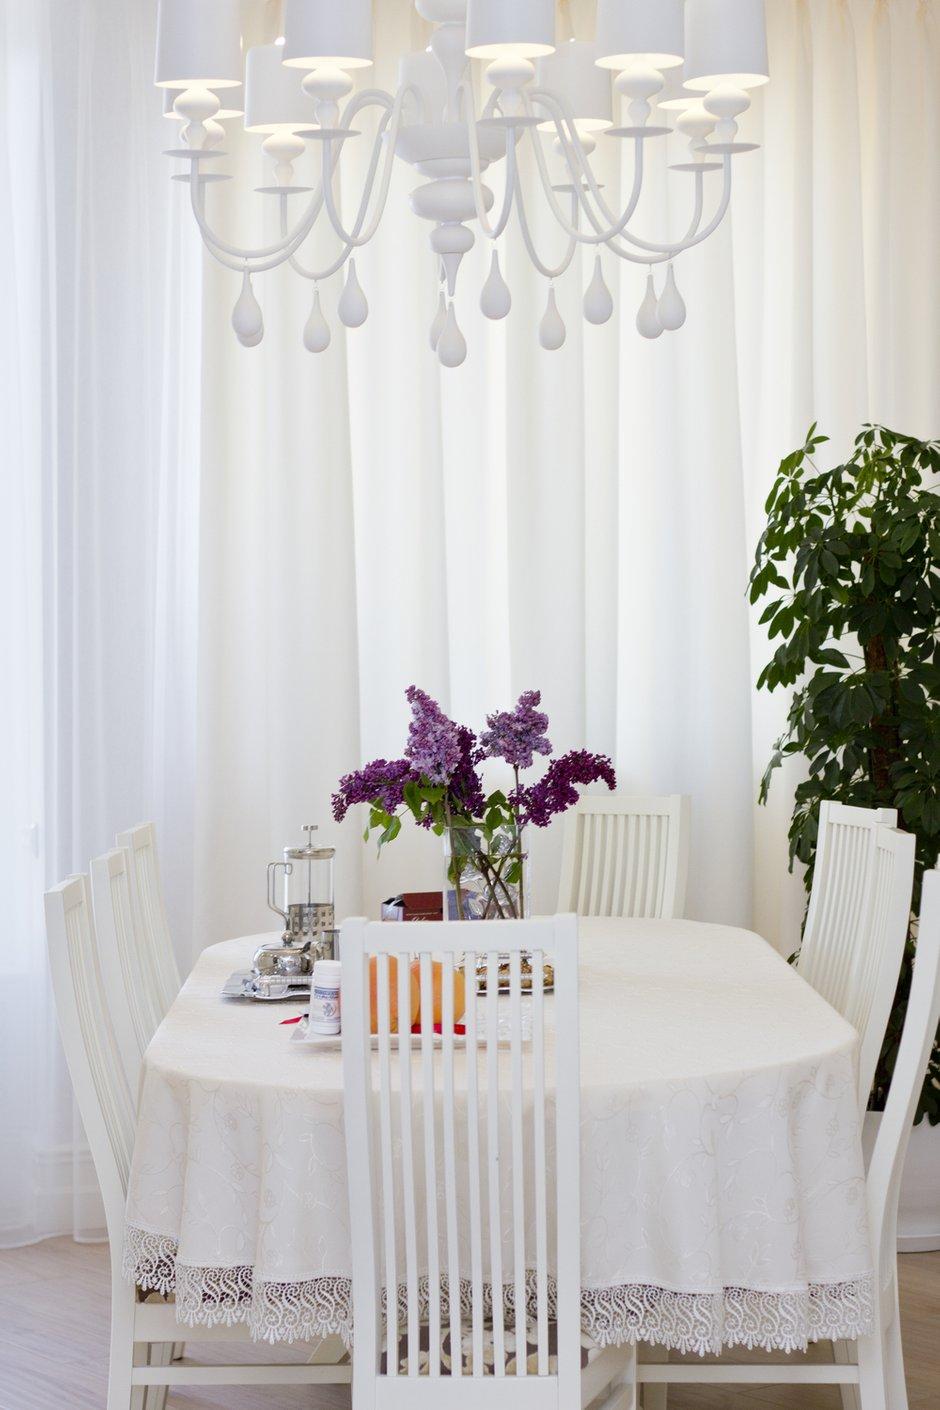 Фотография: Кухня и столовая в стиле Прованс и Кантри, Квартира, Дома и квартиры, Ар-деко – фото на INMYROOM